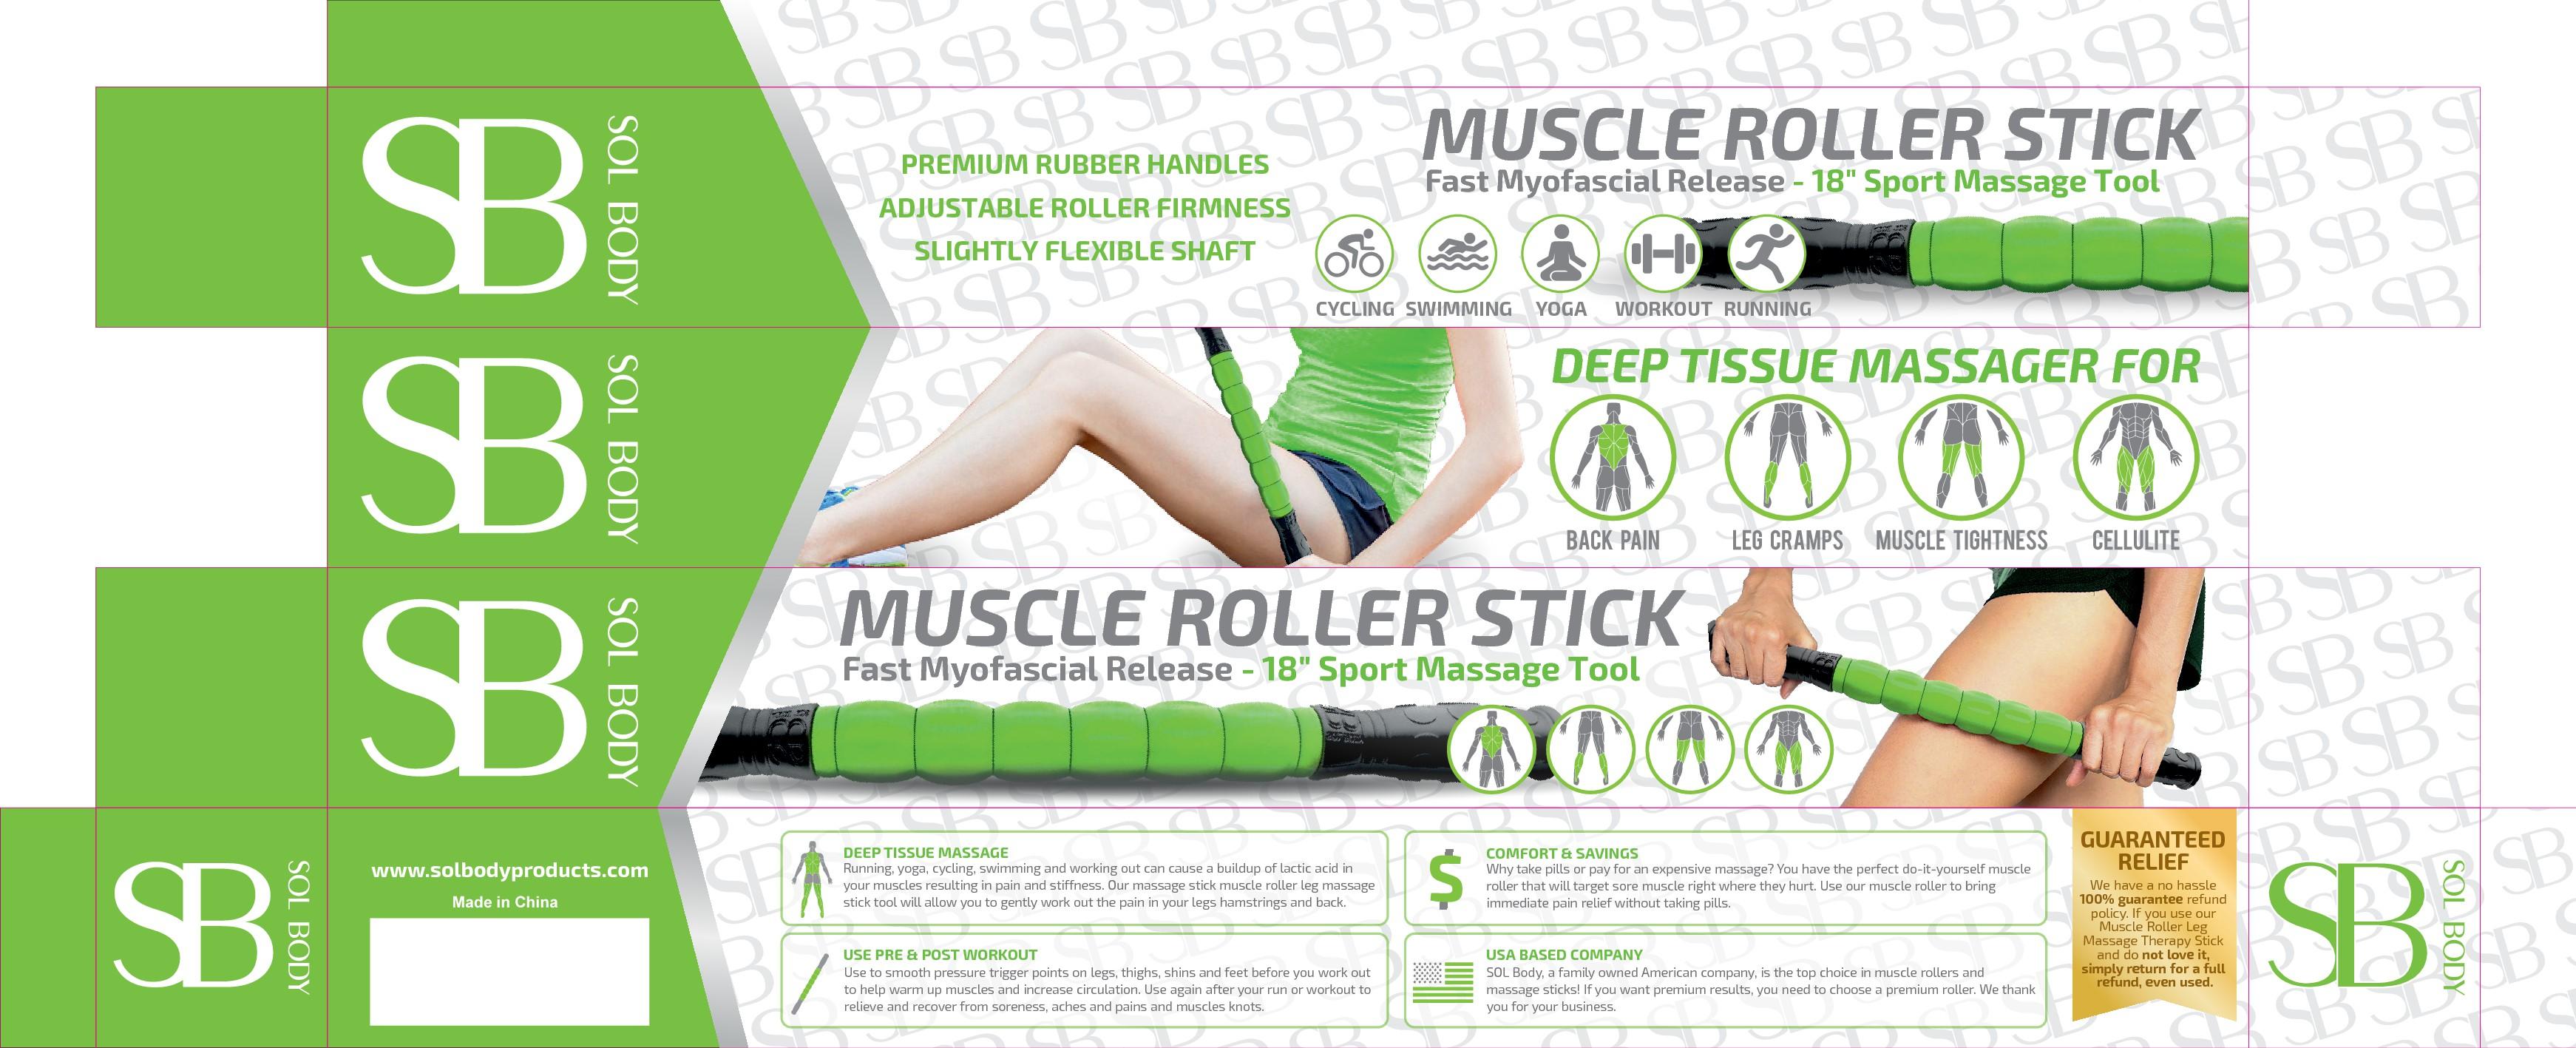 Fitness Product Amazon Box